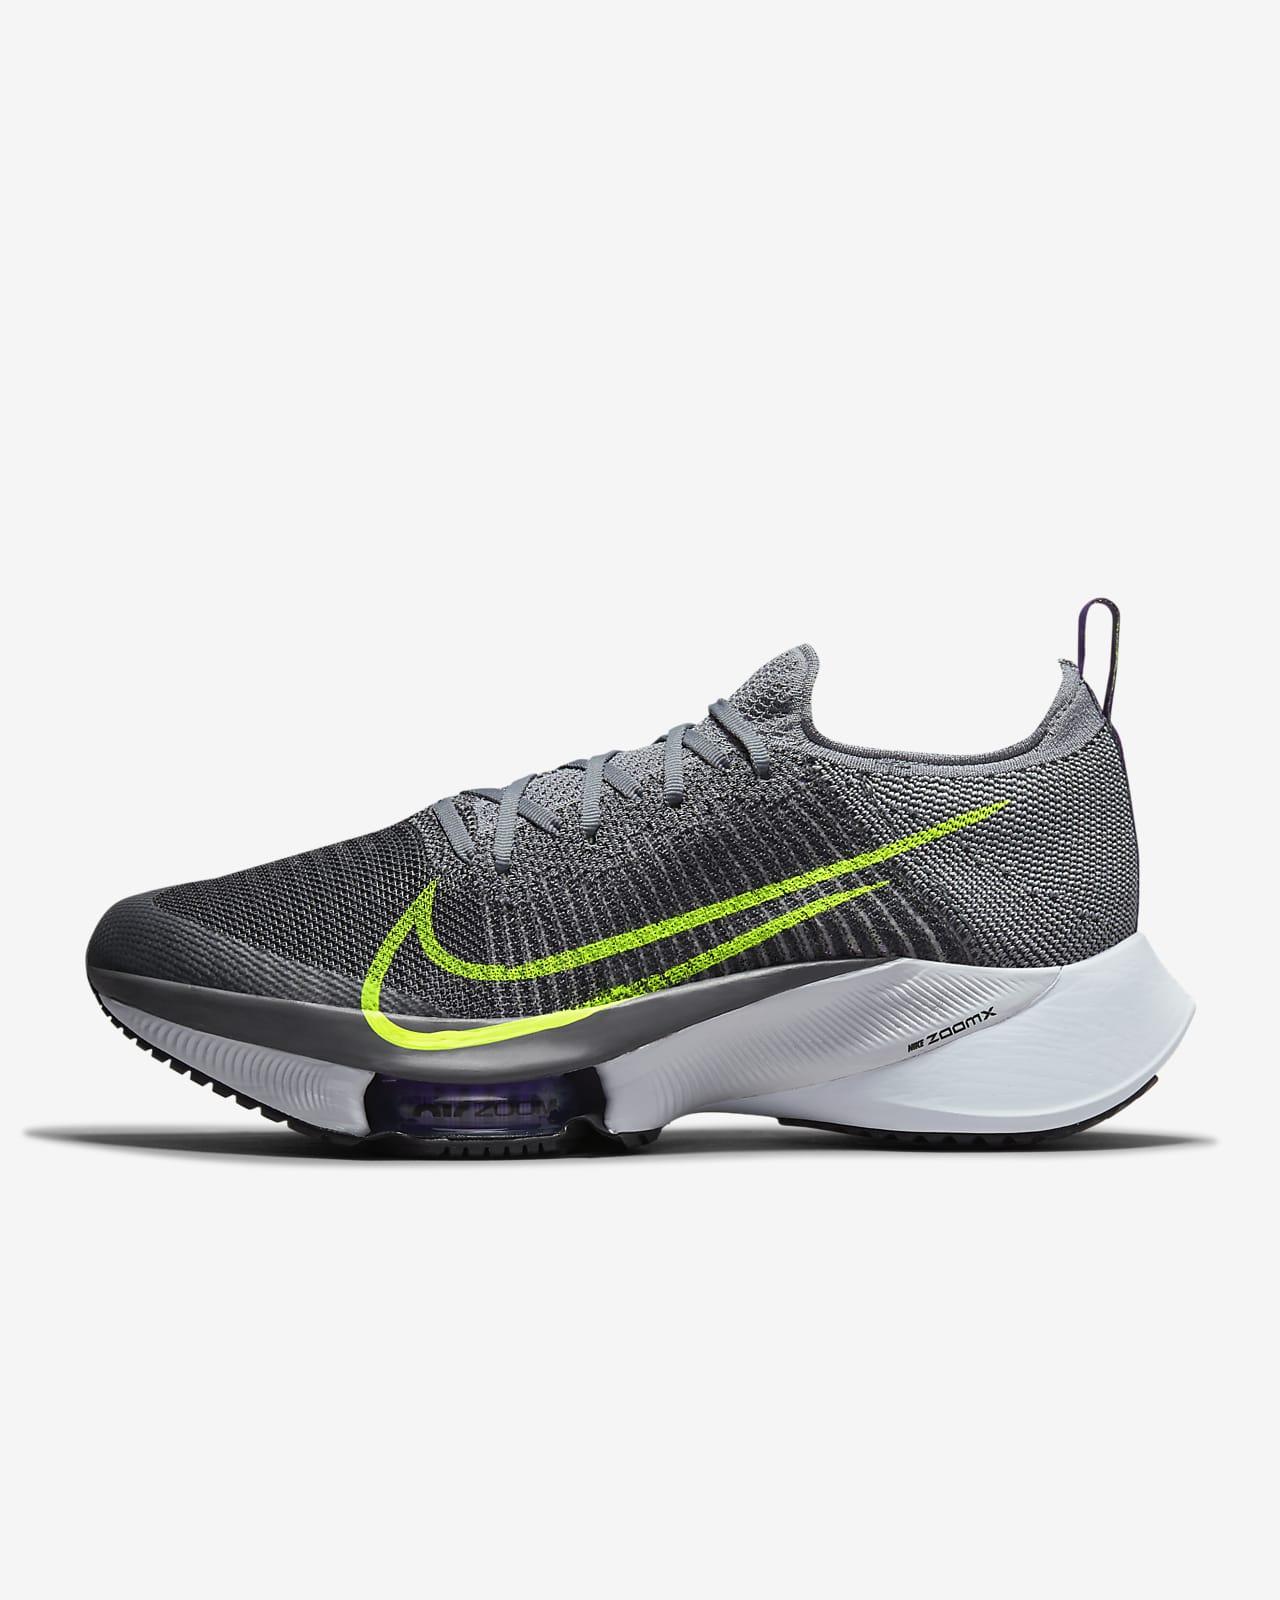 Scarpa da running su strada Nike Air Zoom Tempo NEXT% - Uomo